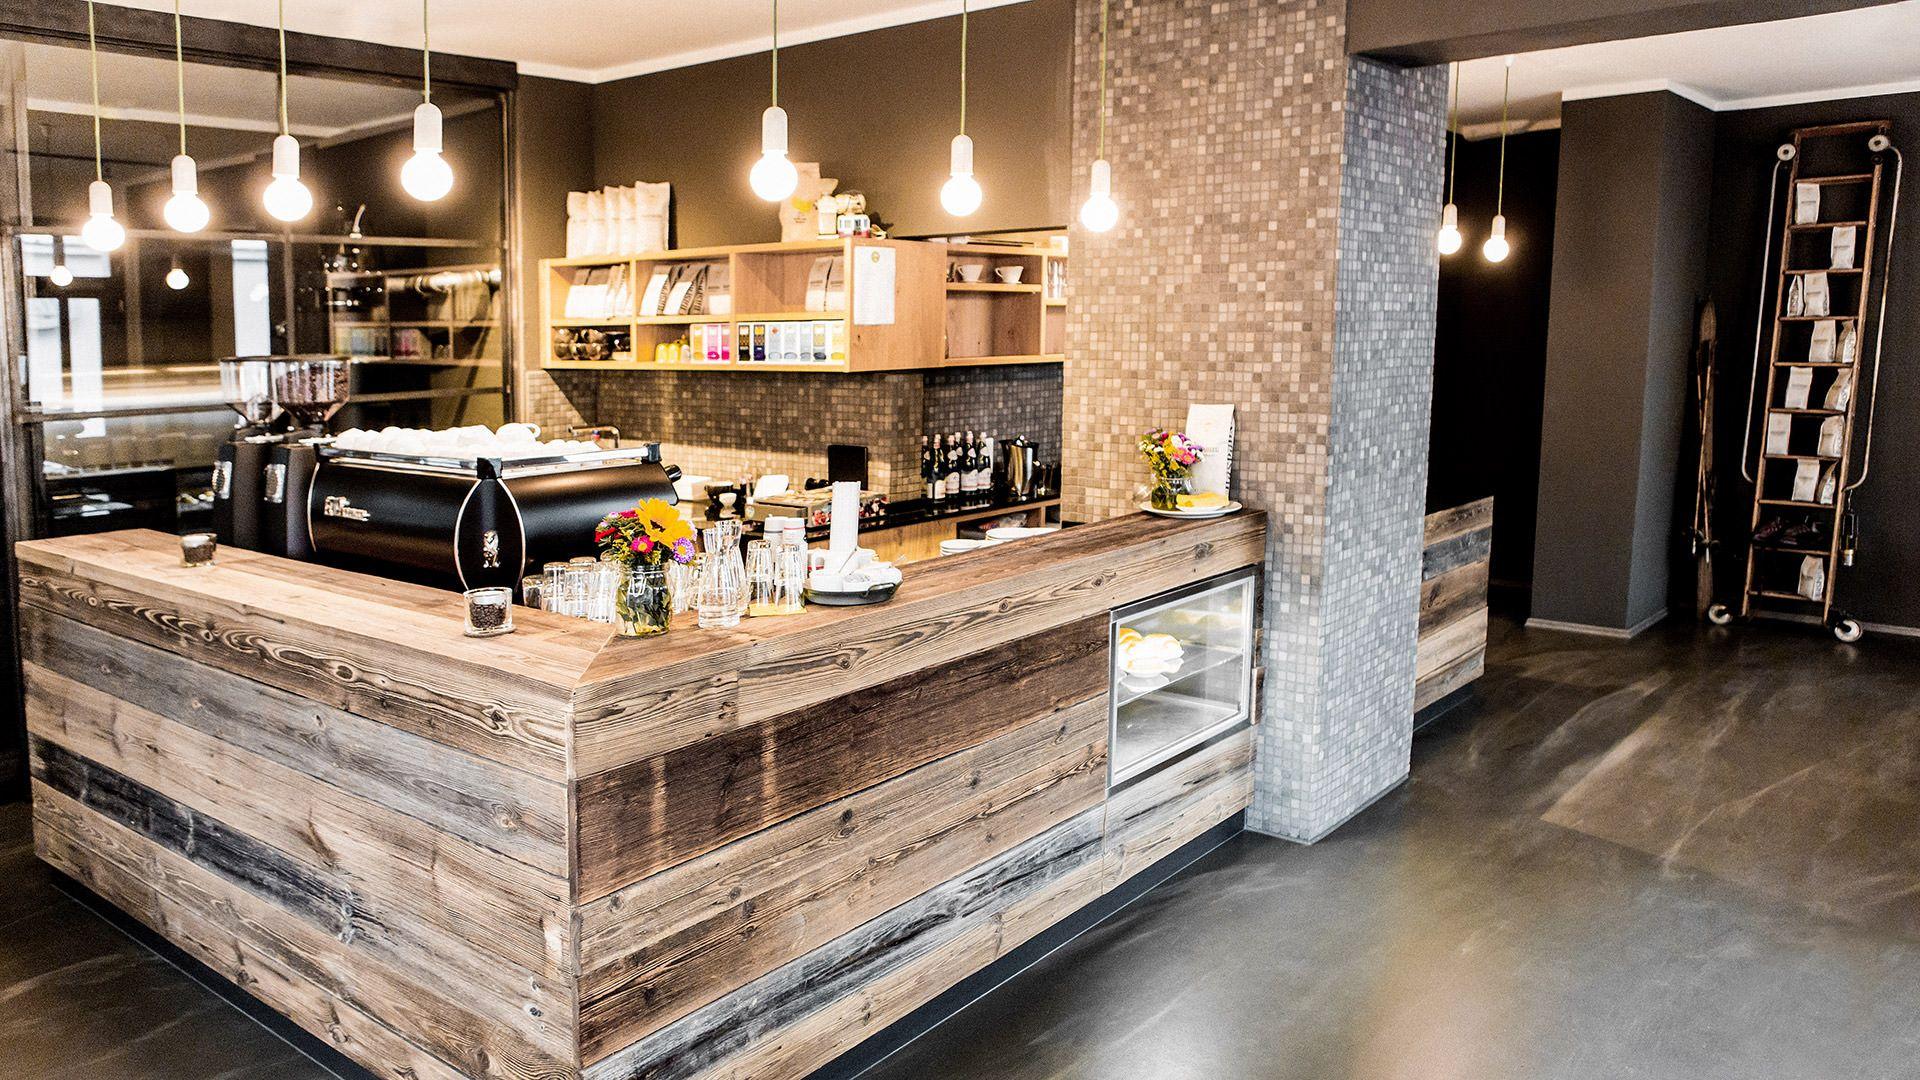 bergbrand cafe r sterei wei gerbergasse 38 90403 n rnberg earth pinterest r sterei. Black Bedroom Furniture Sets. Home Design Ideas